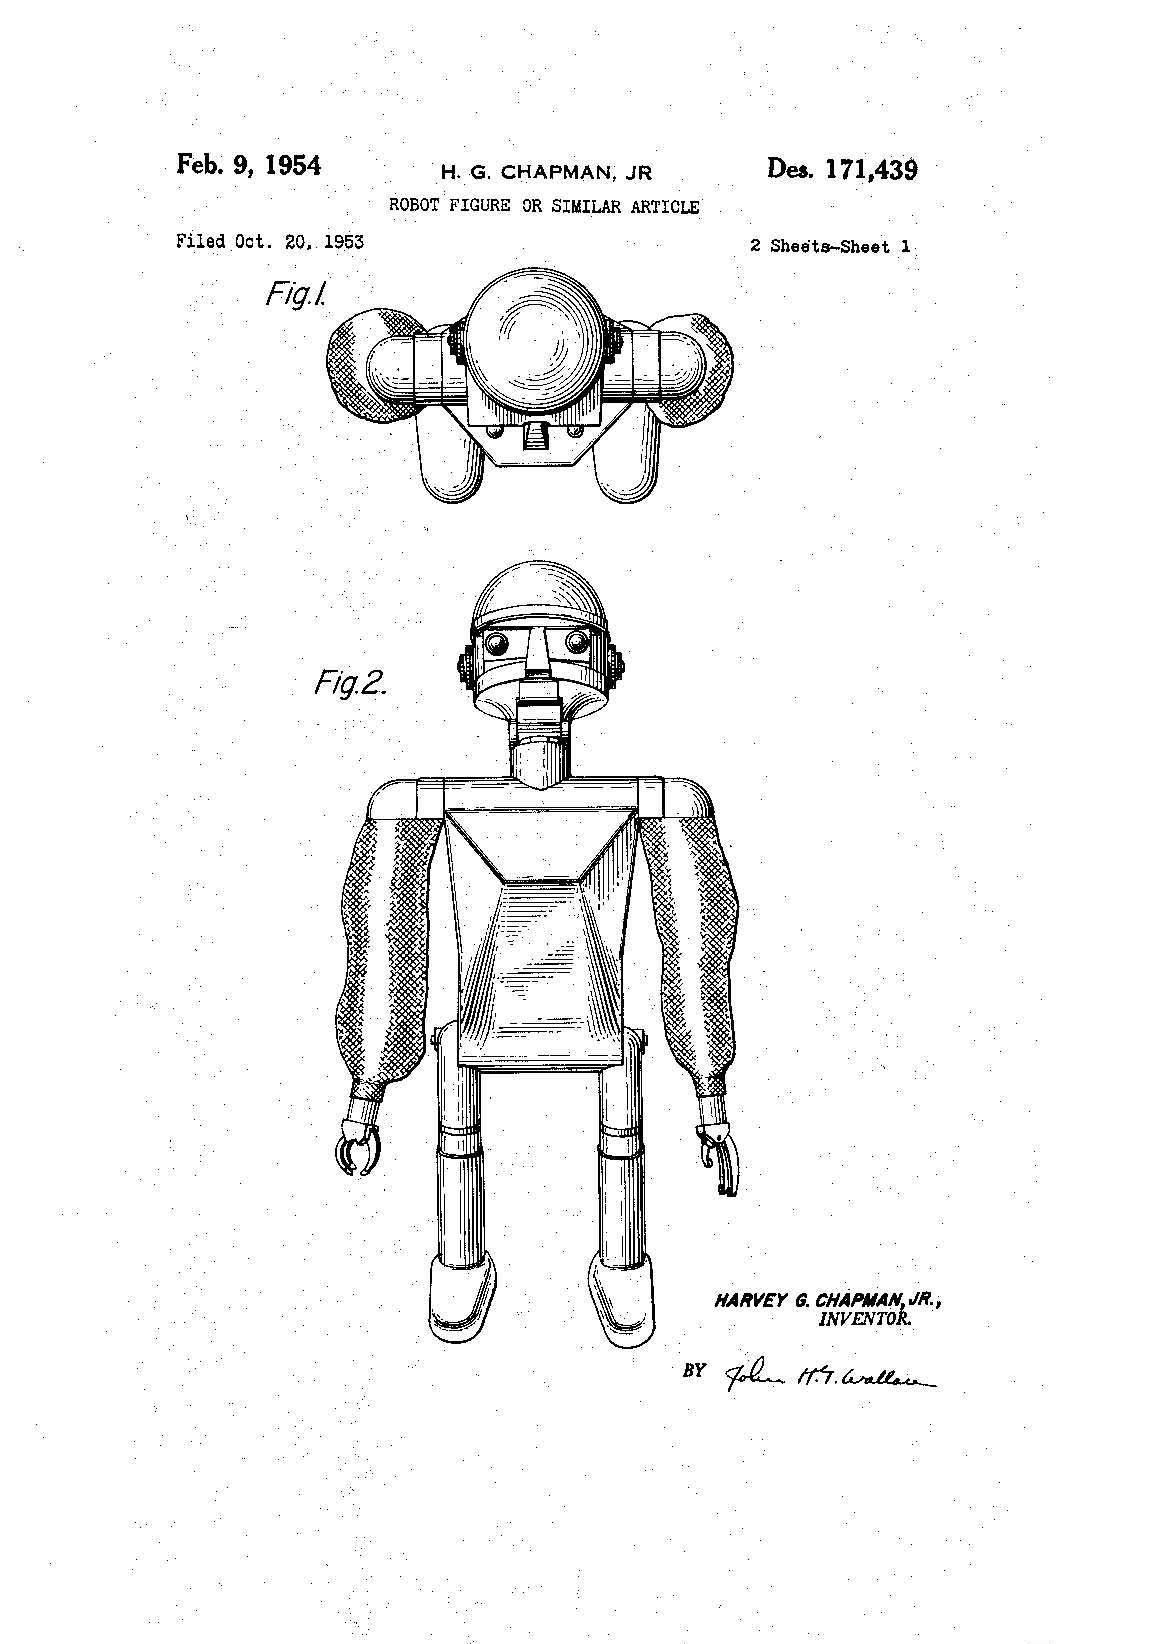 Garco Robot Harvey G Chapman Jr